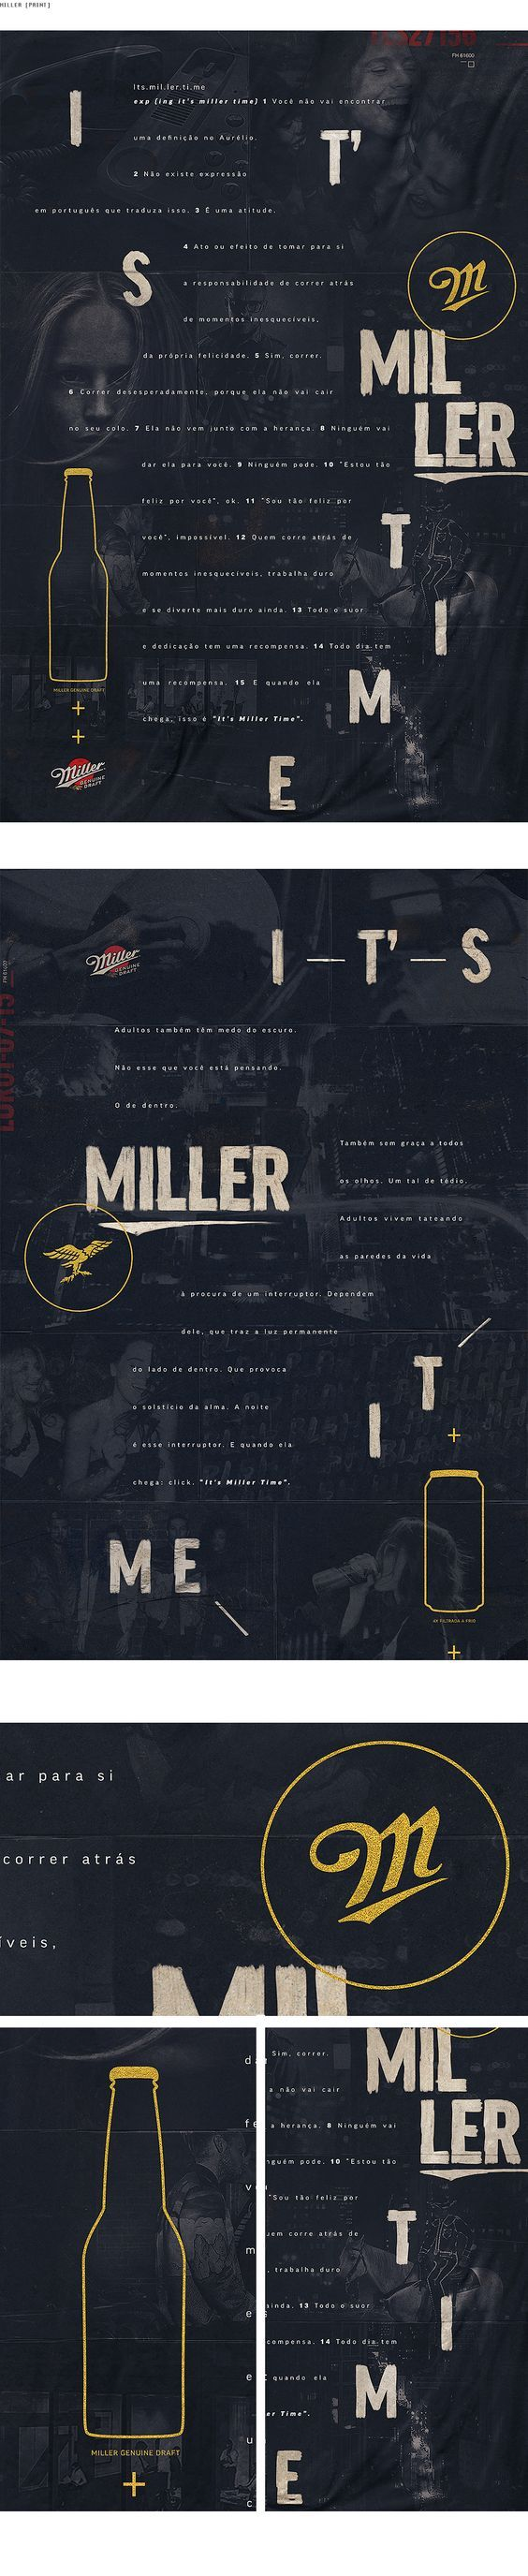 Miller Print - Tales Lima Art Director: